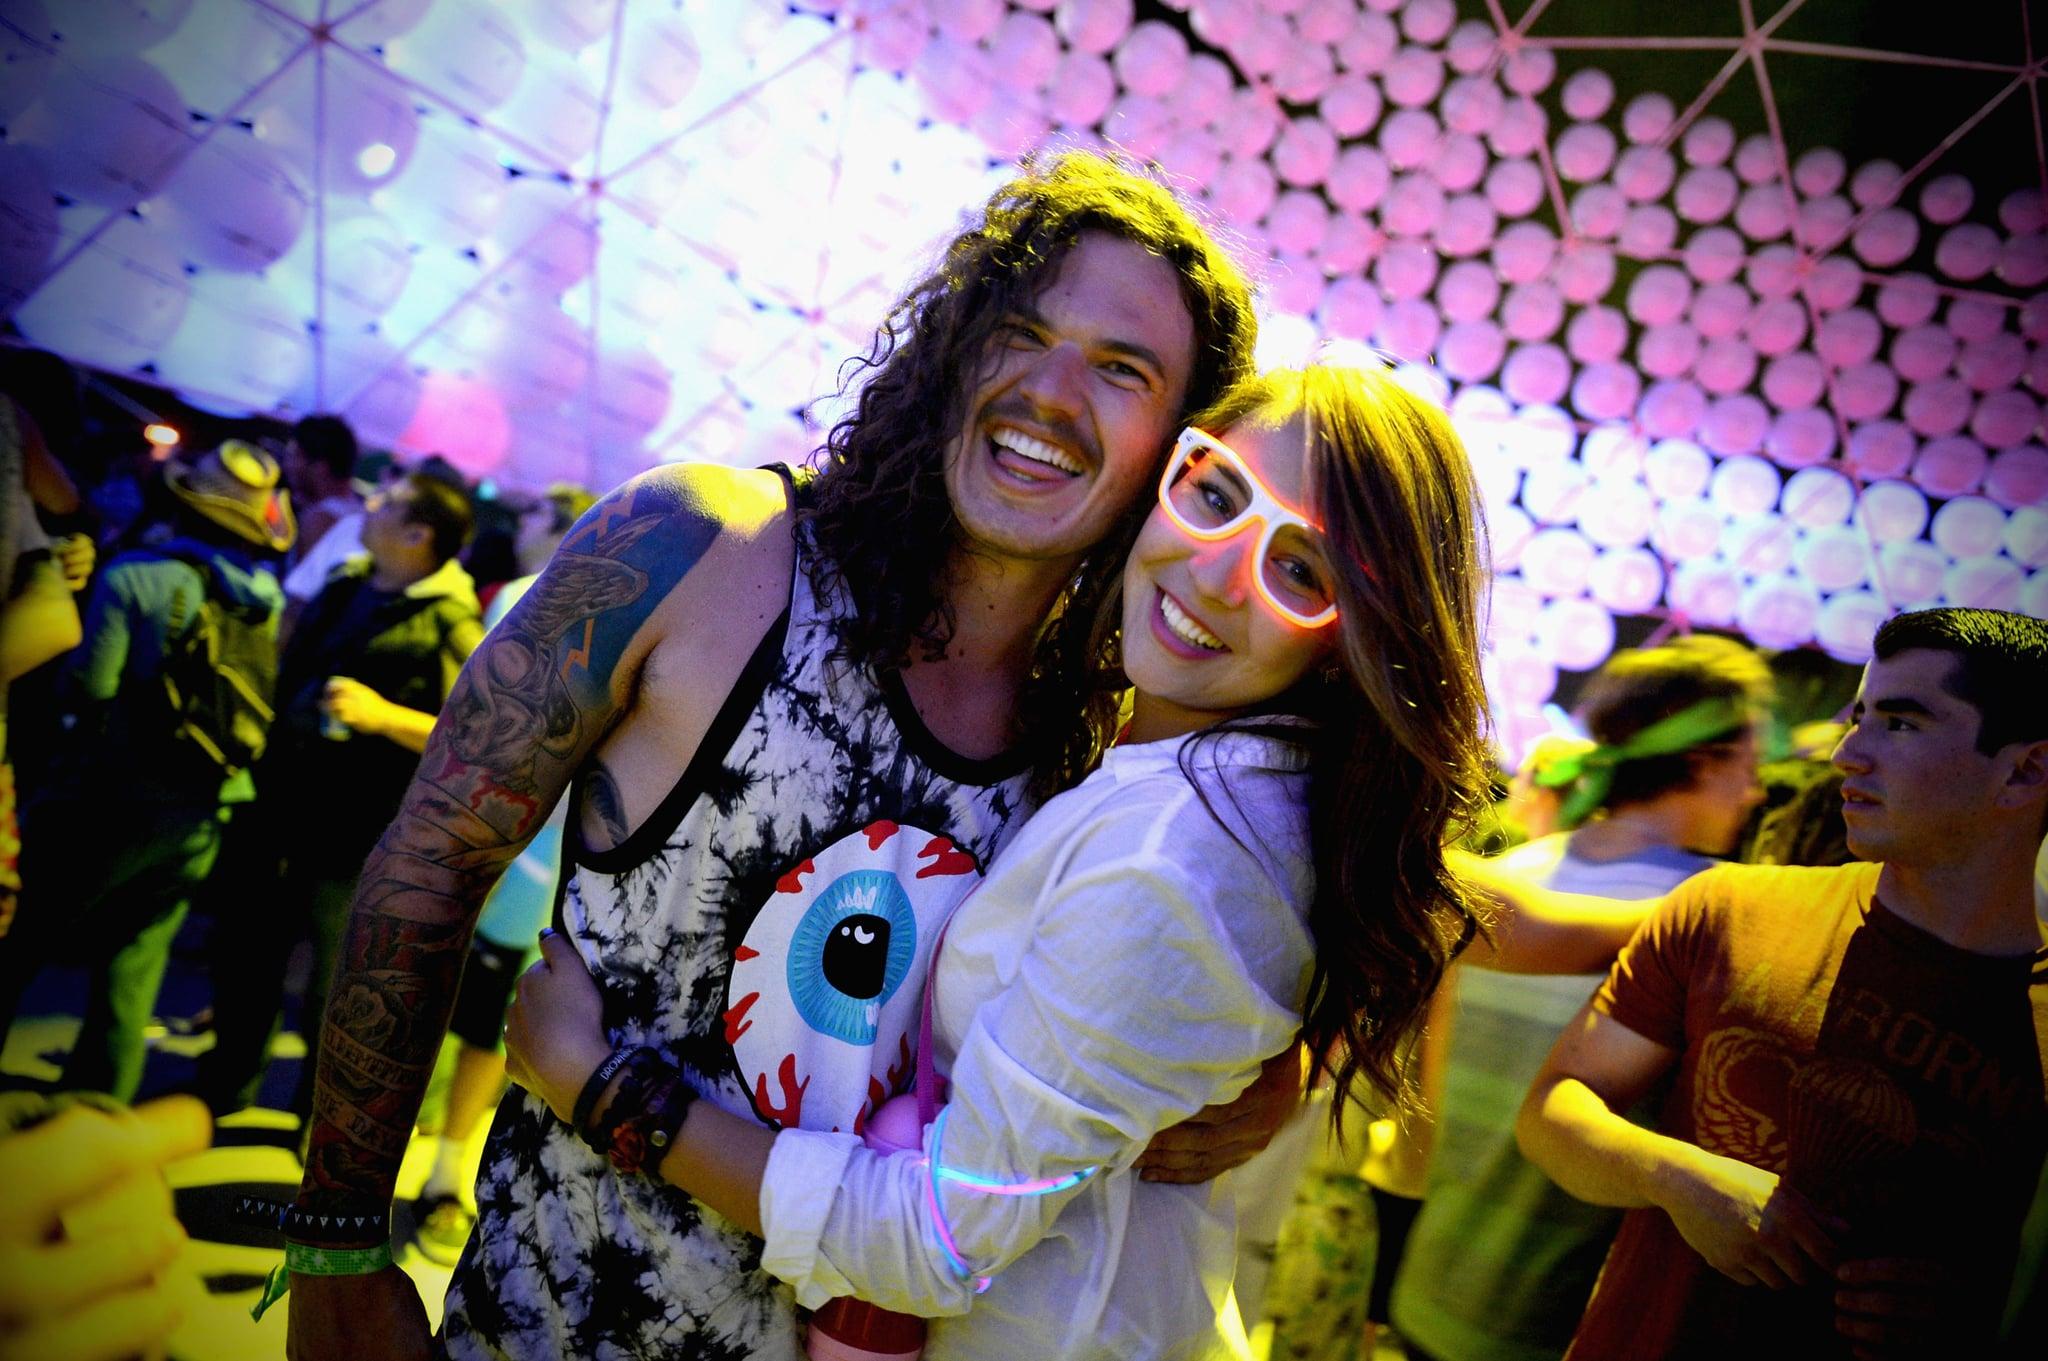 A couple glowed at the Coachella music festival in Indio, CA.